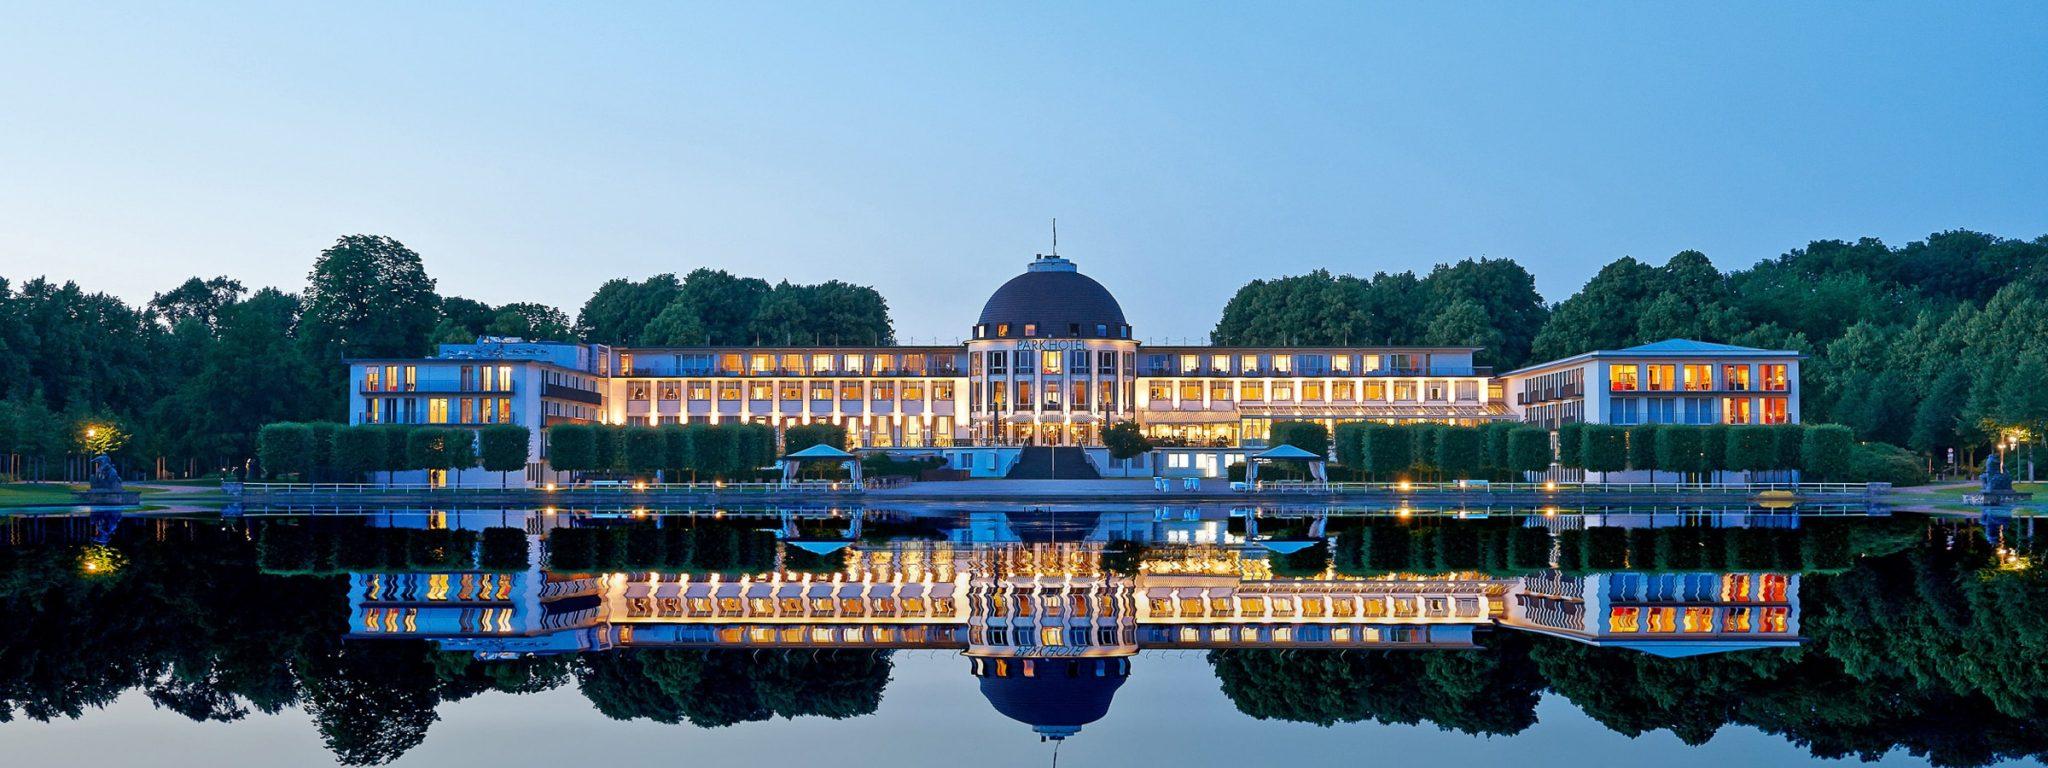 Permalink to Dorint Hotel Mannheim Wellness